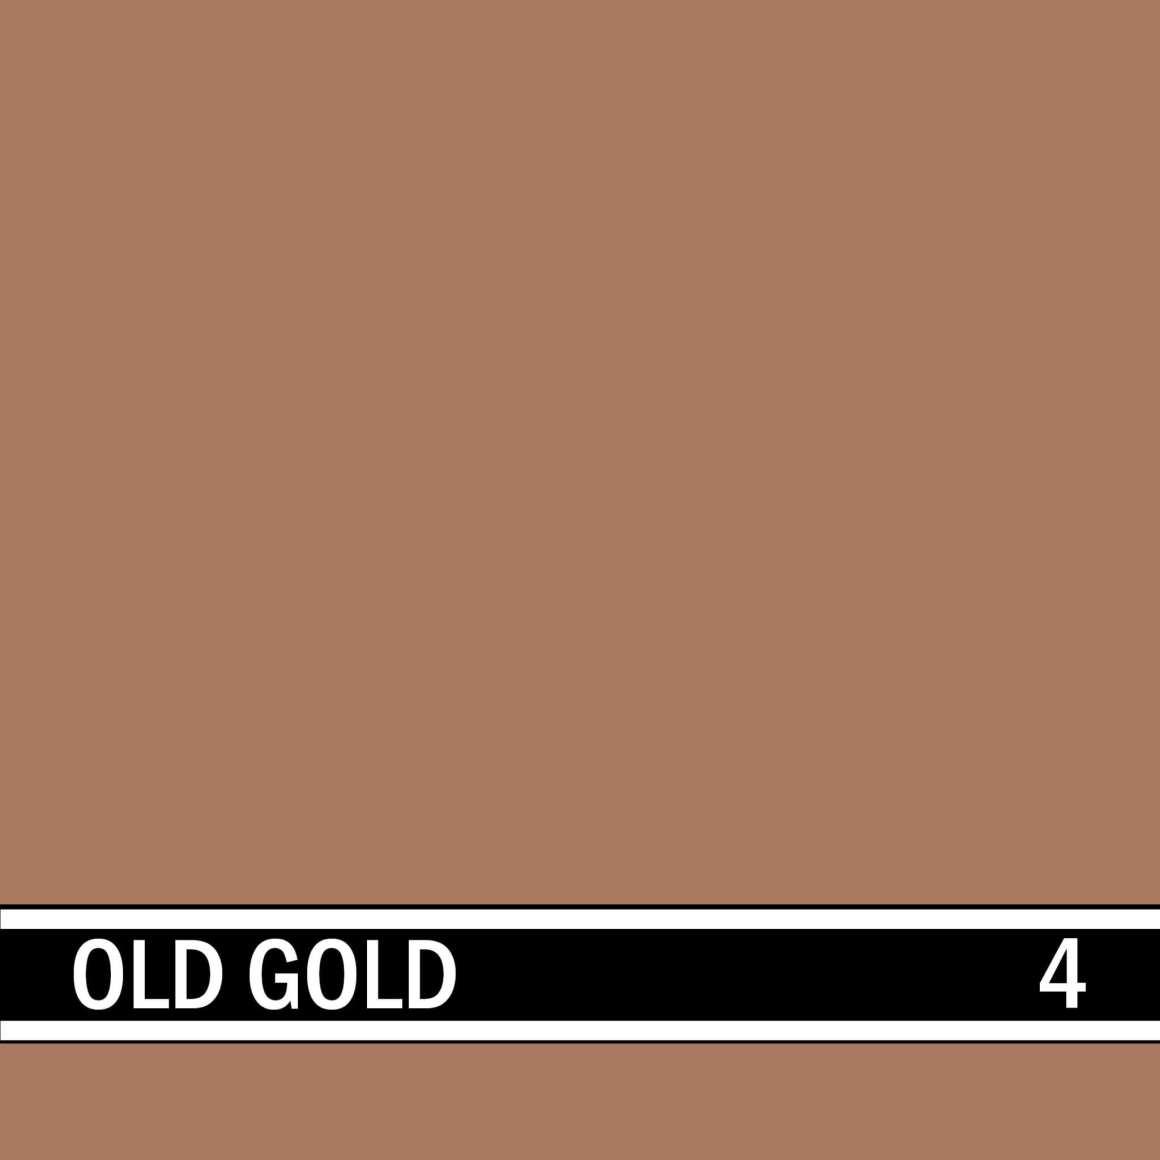 Old Gold integral concrete color for stamped concrete and decorative colored concrete